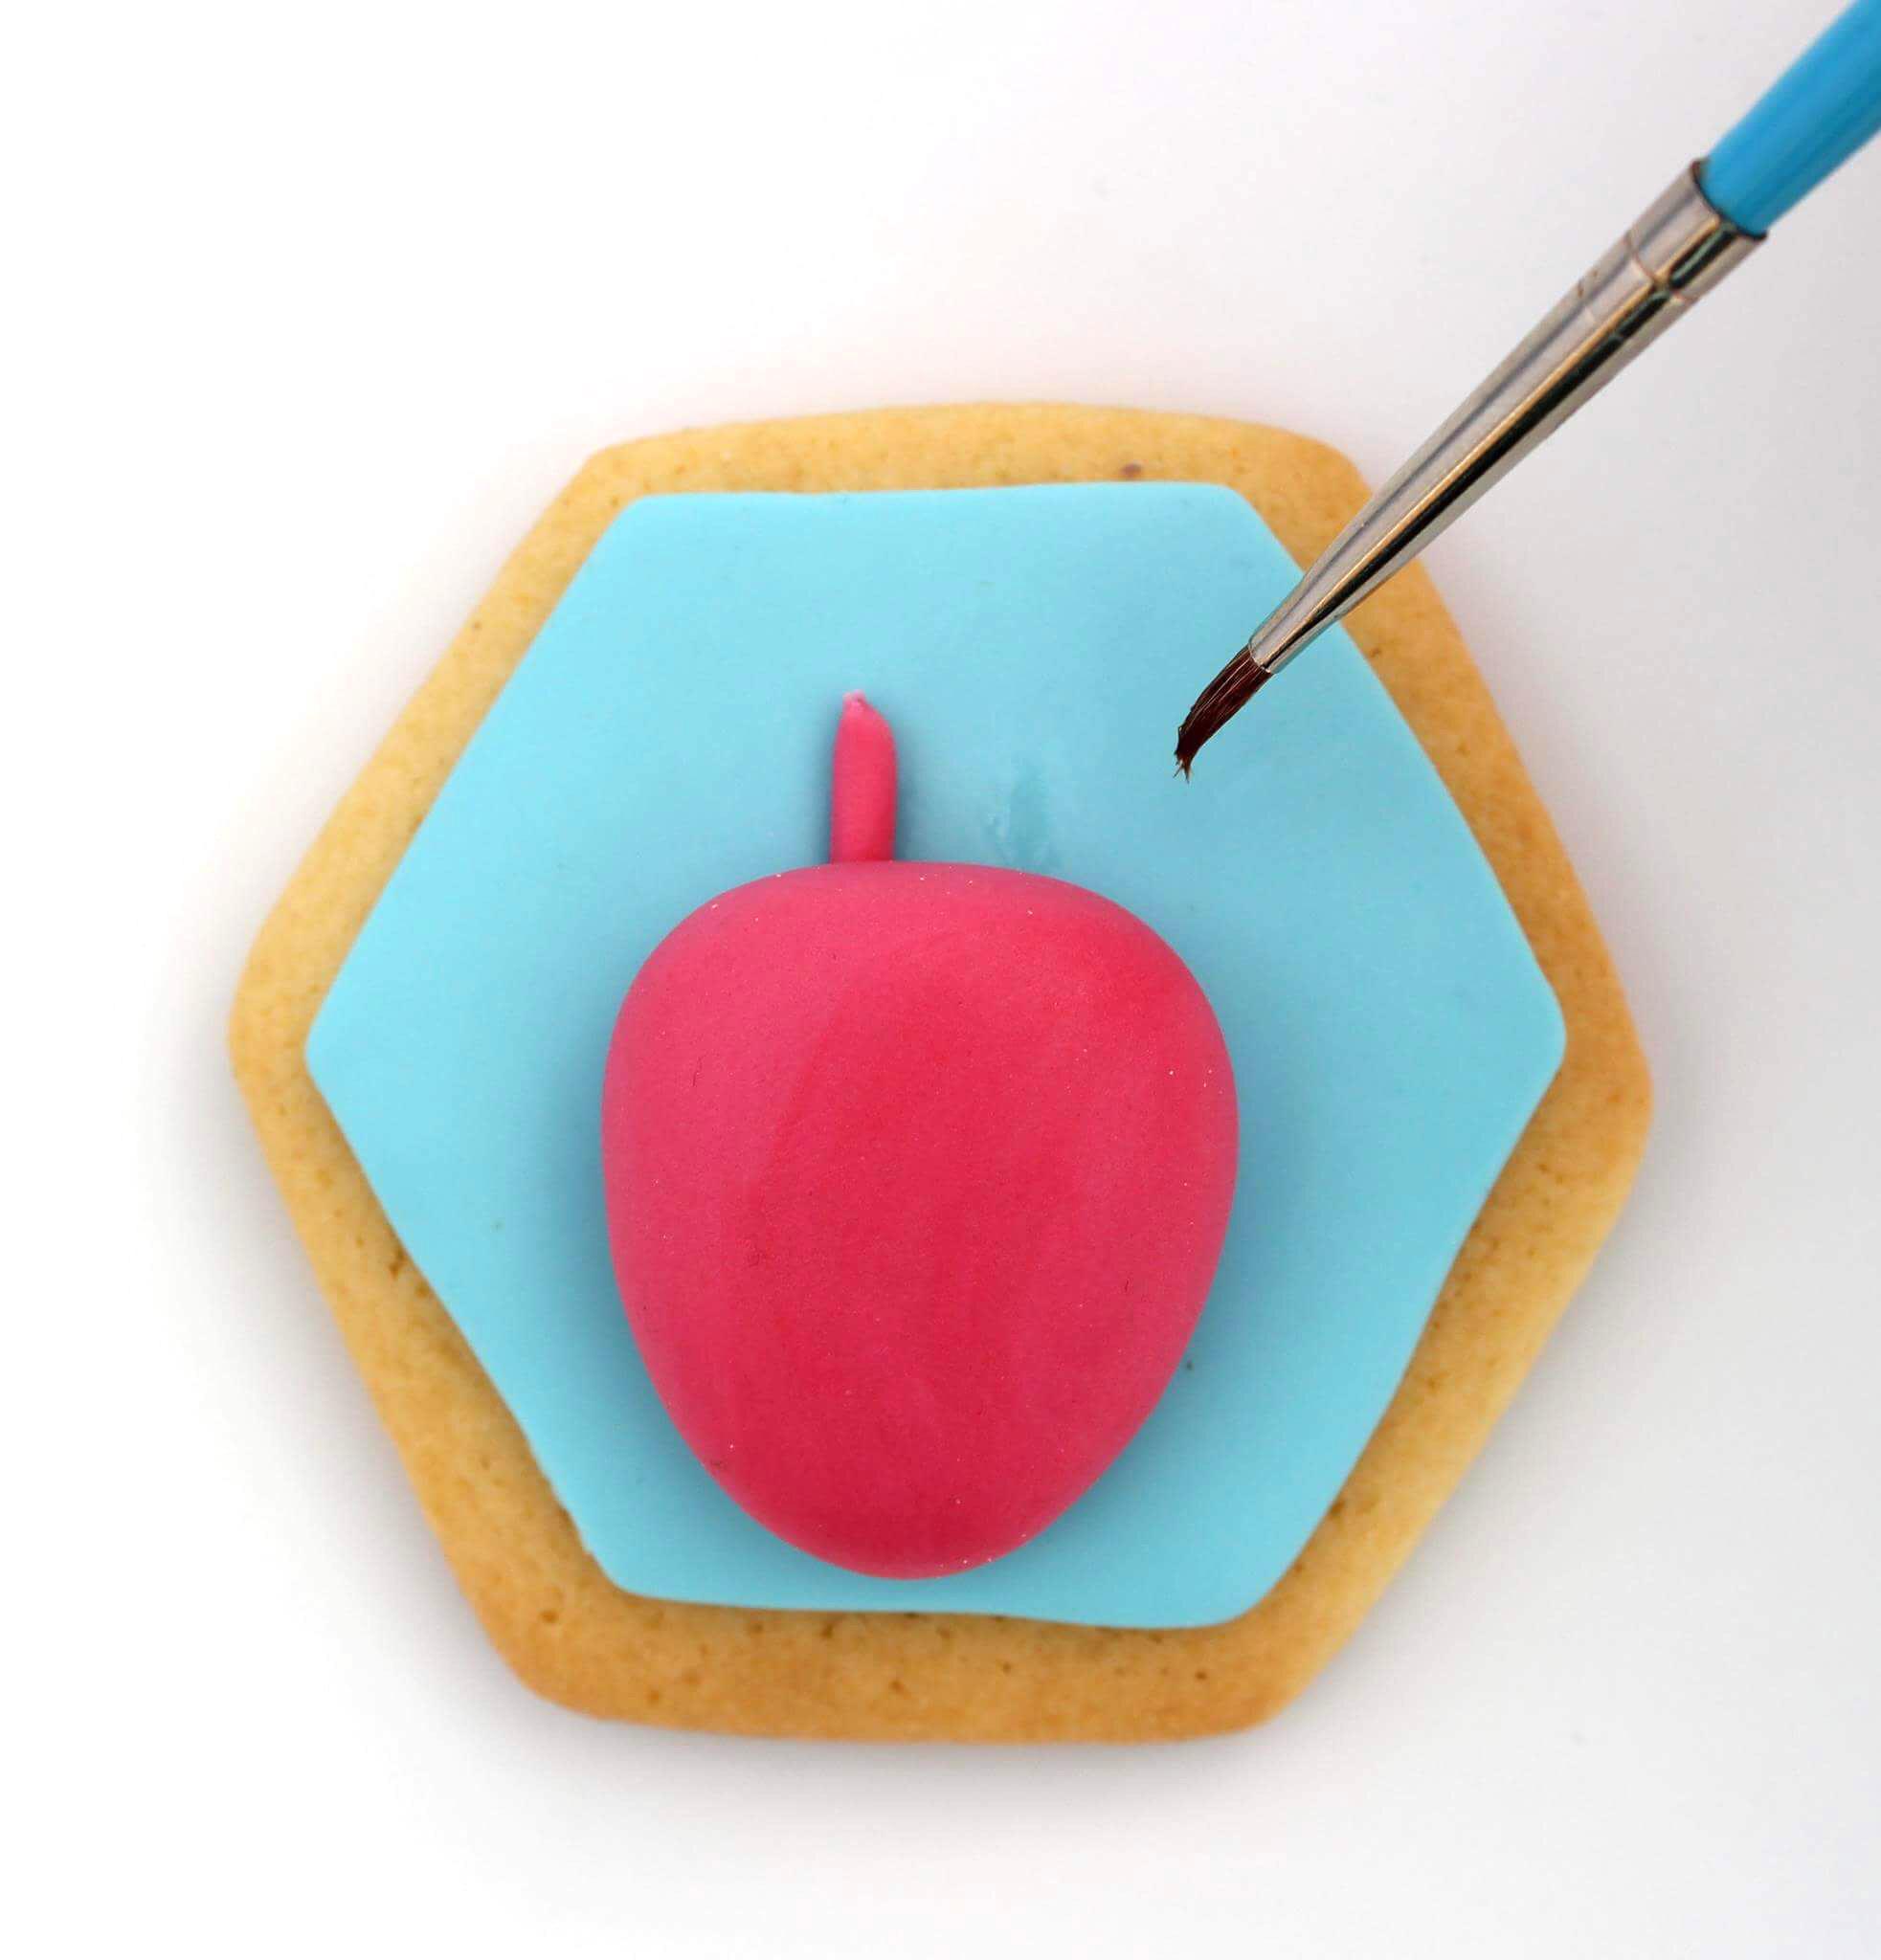 sff17_CrabTutorial-Monique-Ascanelli-The-Cake-Topper-Step1.JPG#asset:17072